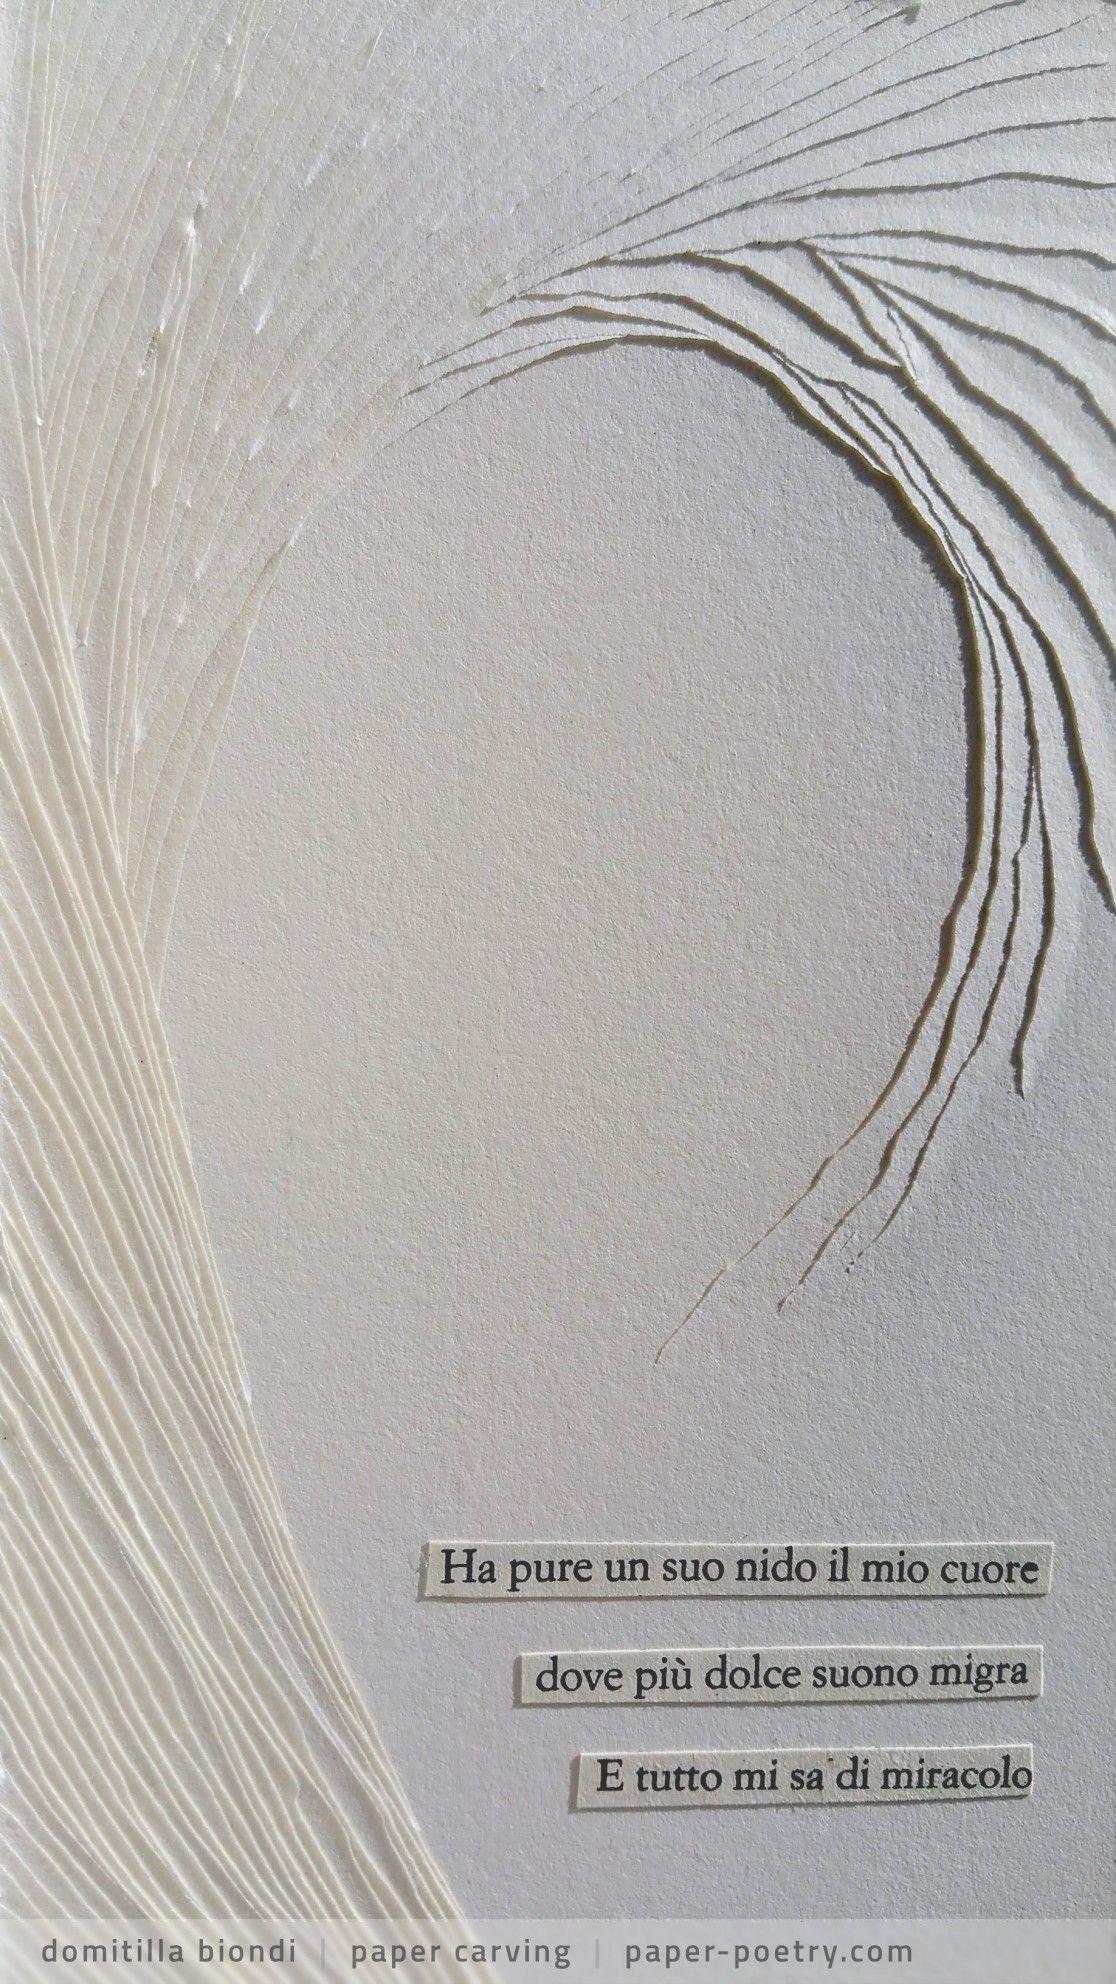 Quasimodo Remixed #8 - paper poetry by Domitilla Biondi